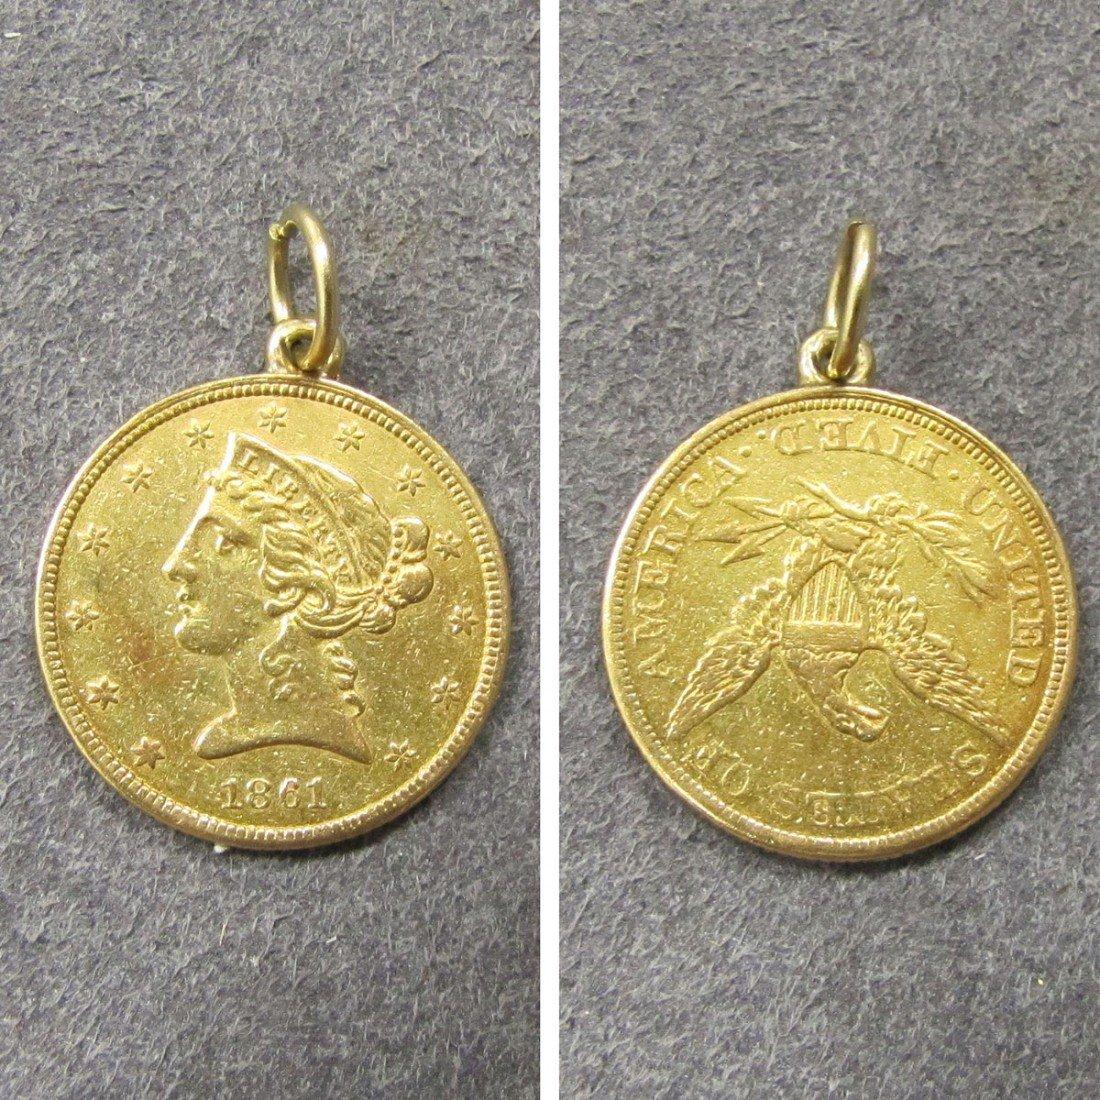 290: U.S. GOLD $5 CORONET HEAD COIN, 1861